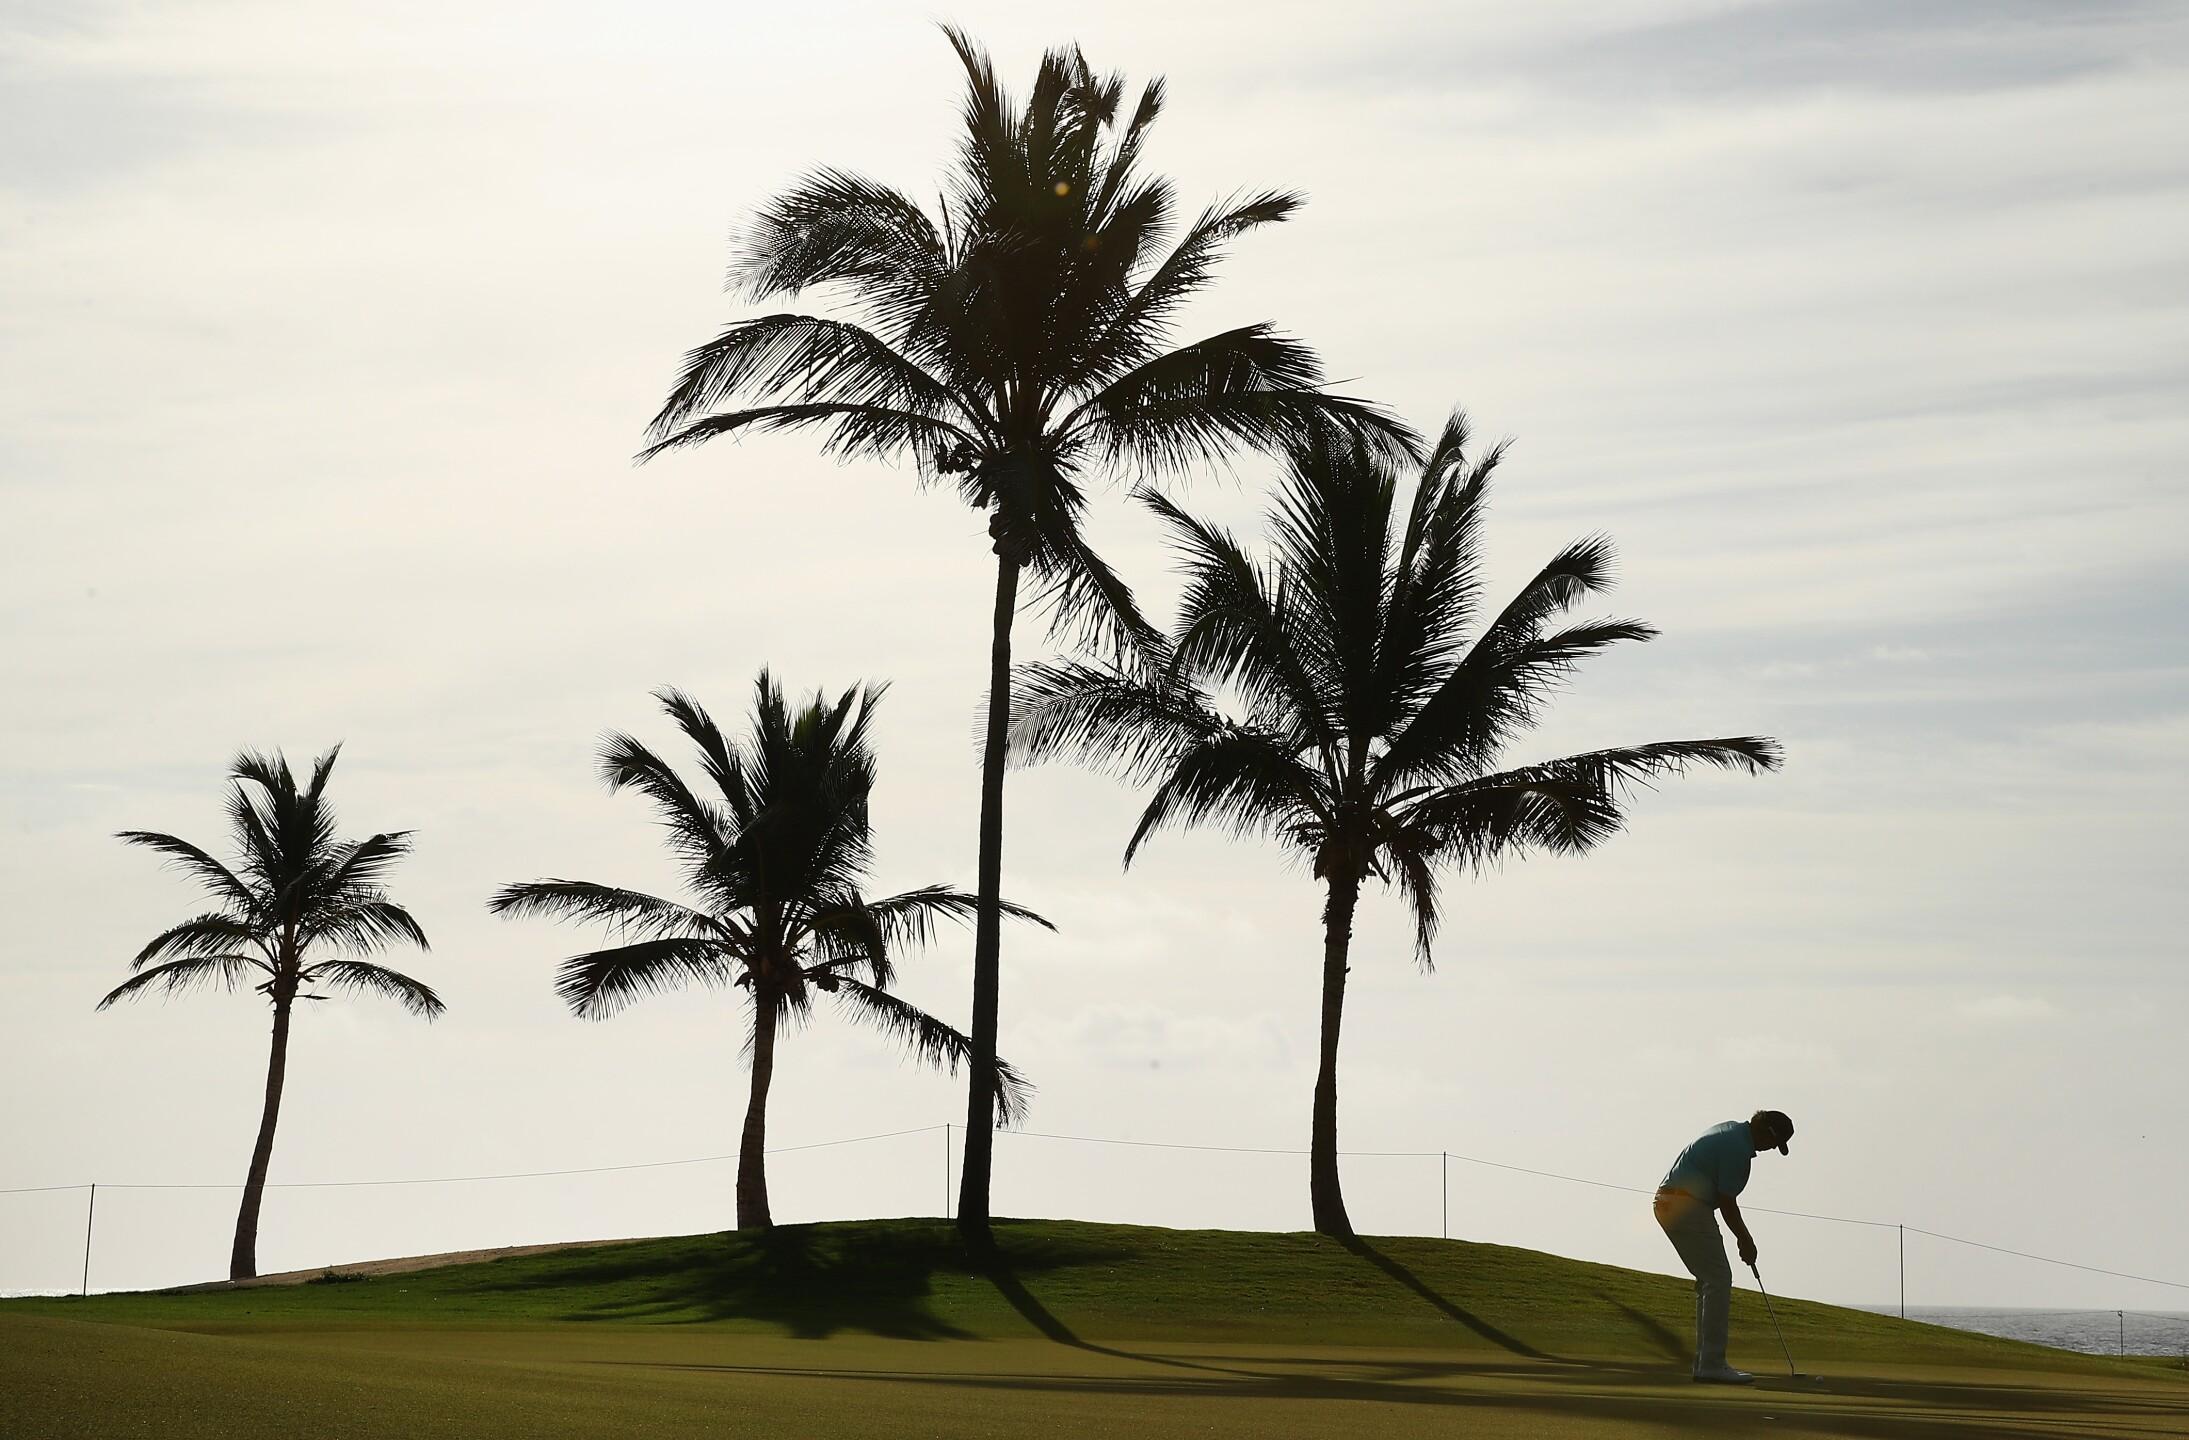 Golfer in Punta Cana, Mexico